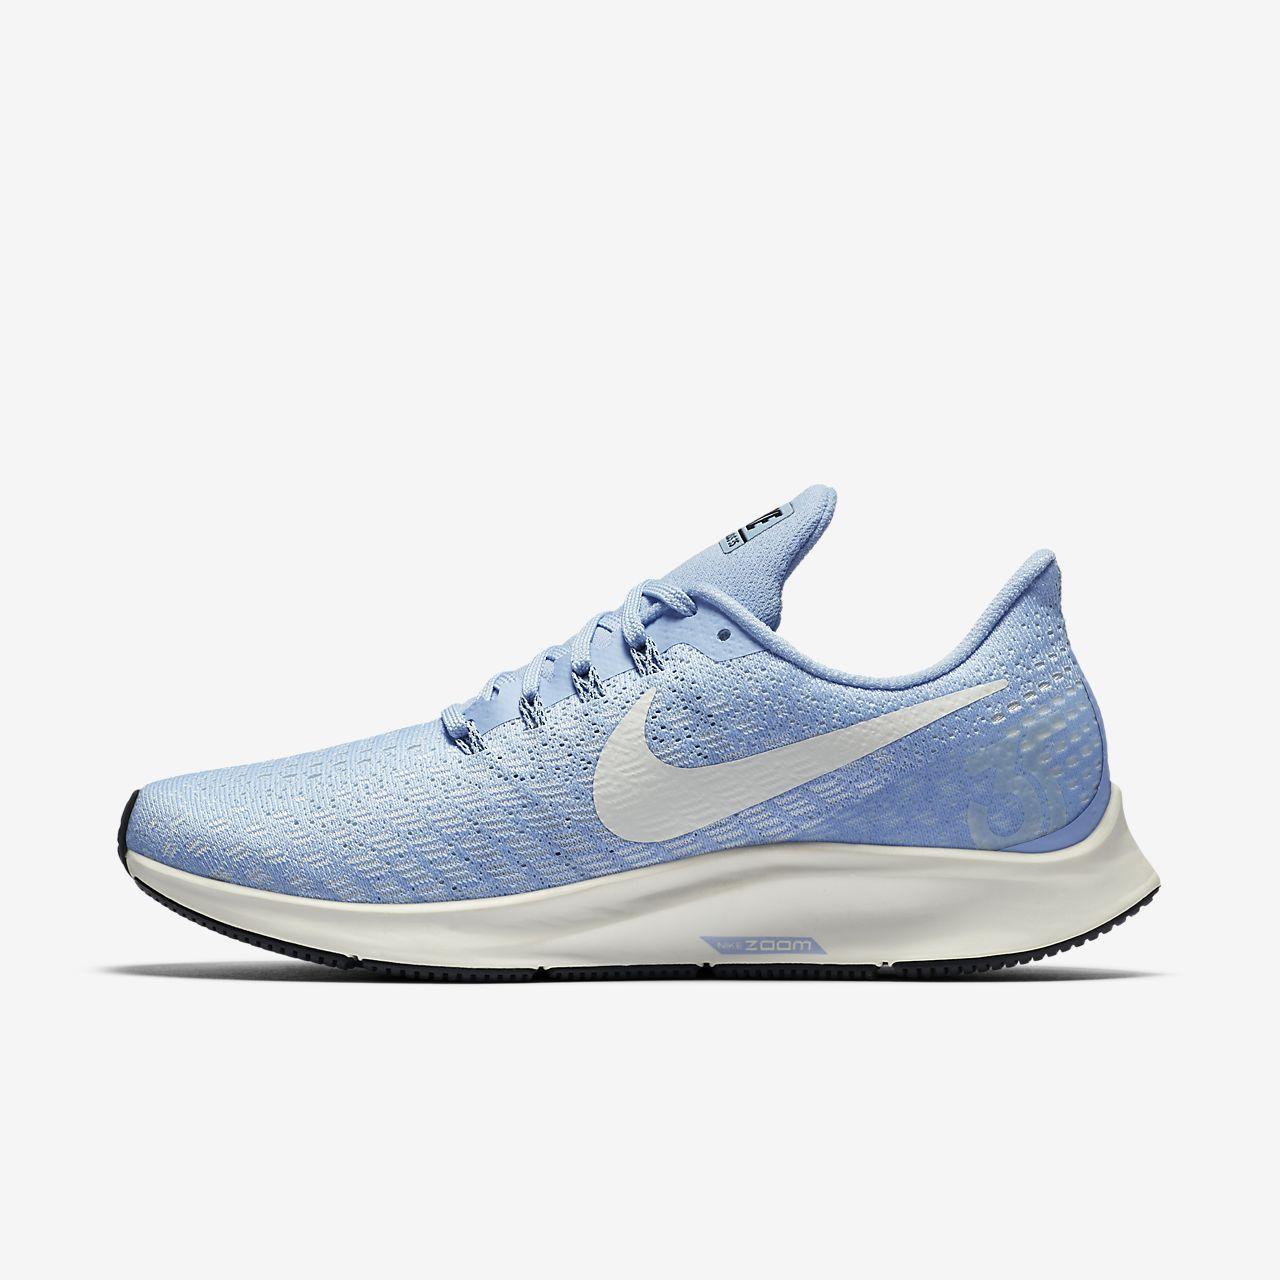 06fabba04d Sapatilhas de running Nike Air Zoom Pegasus 35 para mulher. Nike.com PT